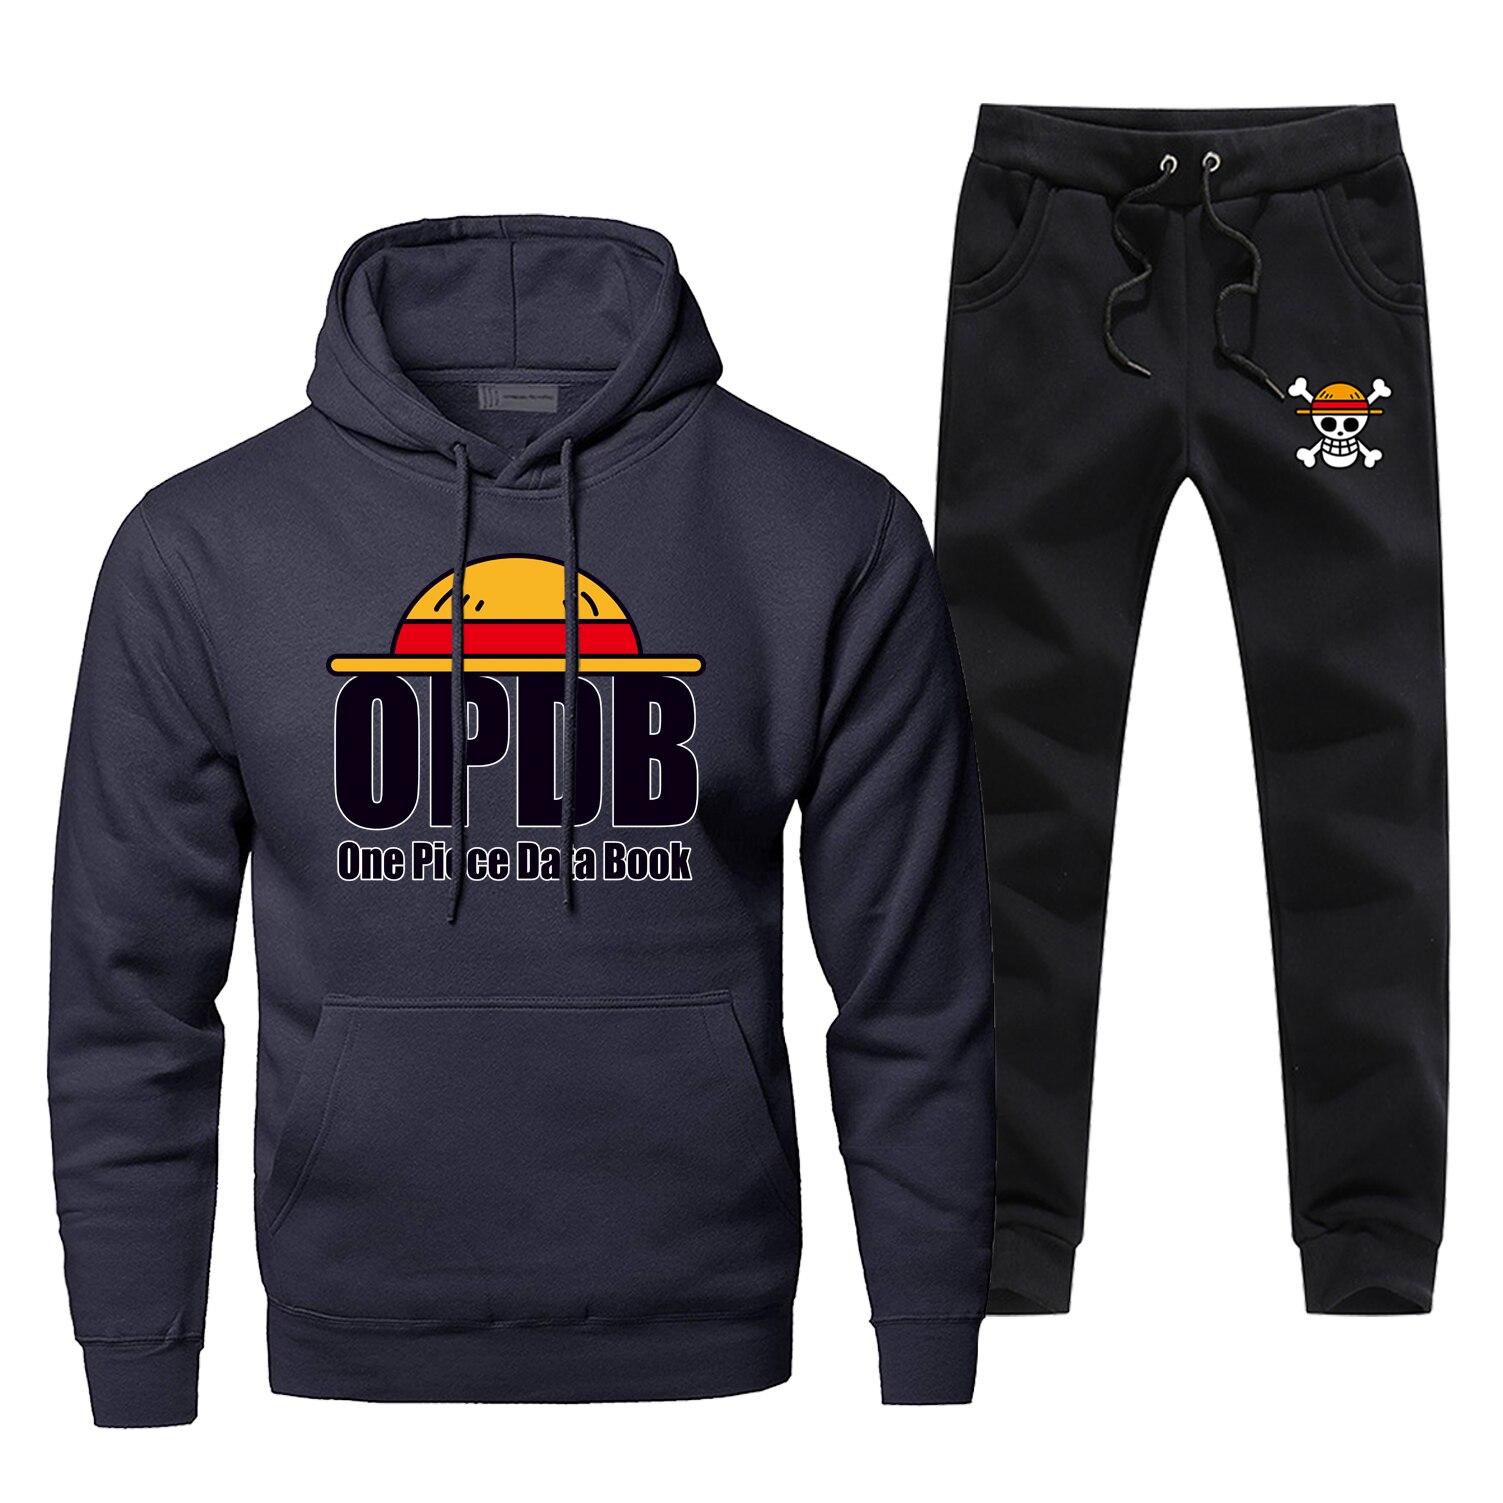 Mens Hoodies One Piece Sets Two Piece Pant Hoodie Sweatshirt Japan Anime Sweatpants Streetwear Sportswear Harajuku Sweatshirts